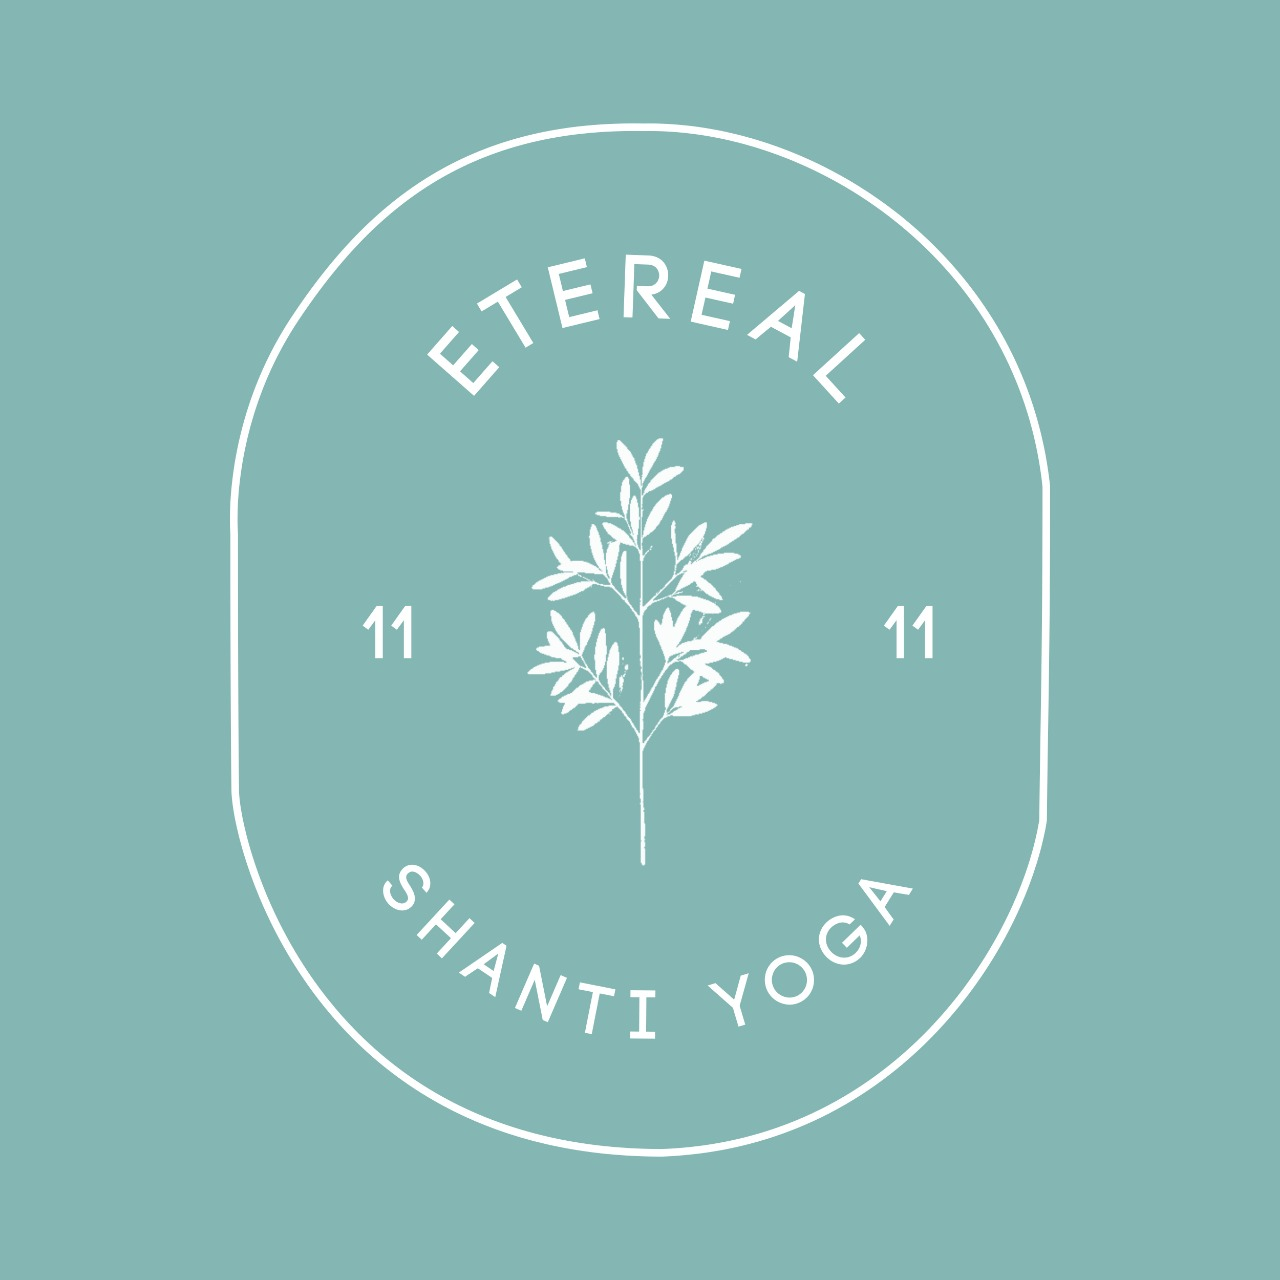 logo de Etereal Shanti Yoga